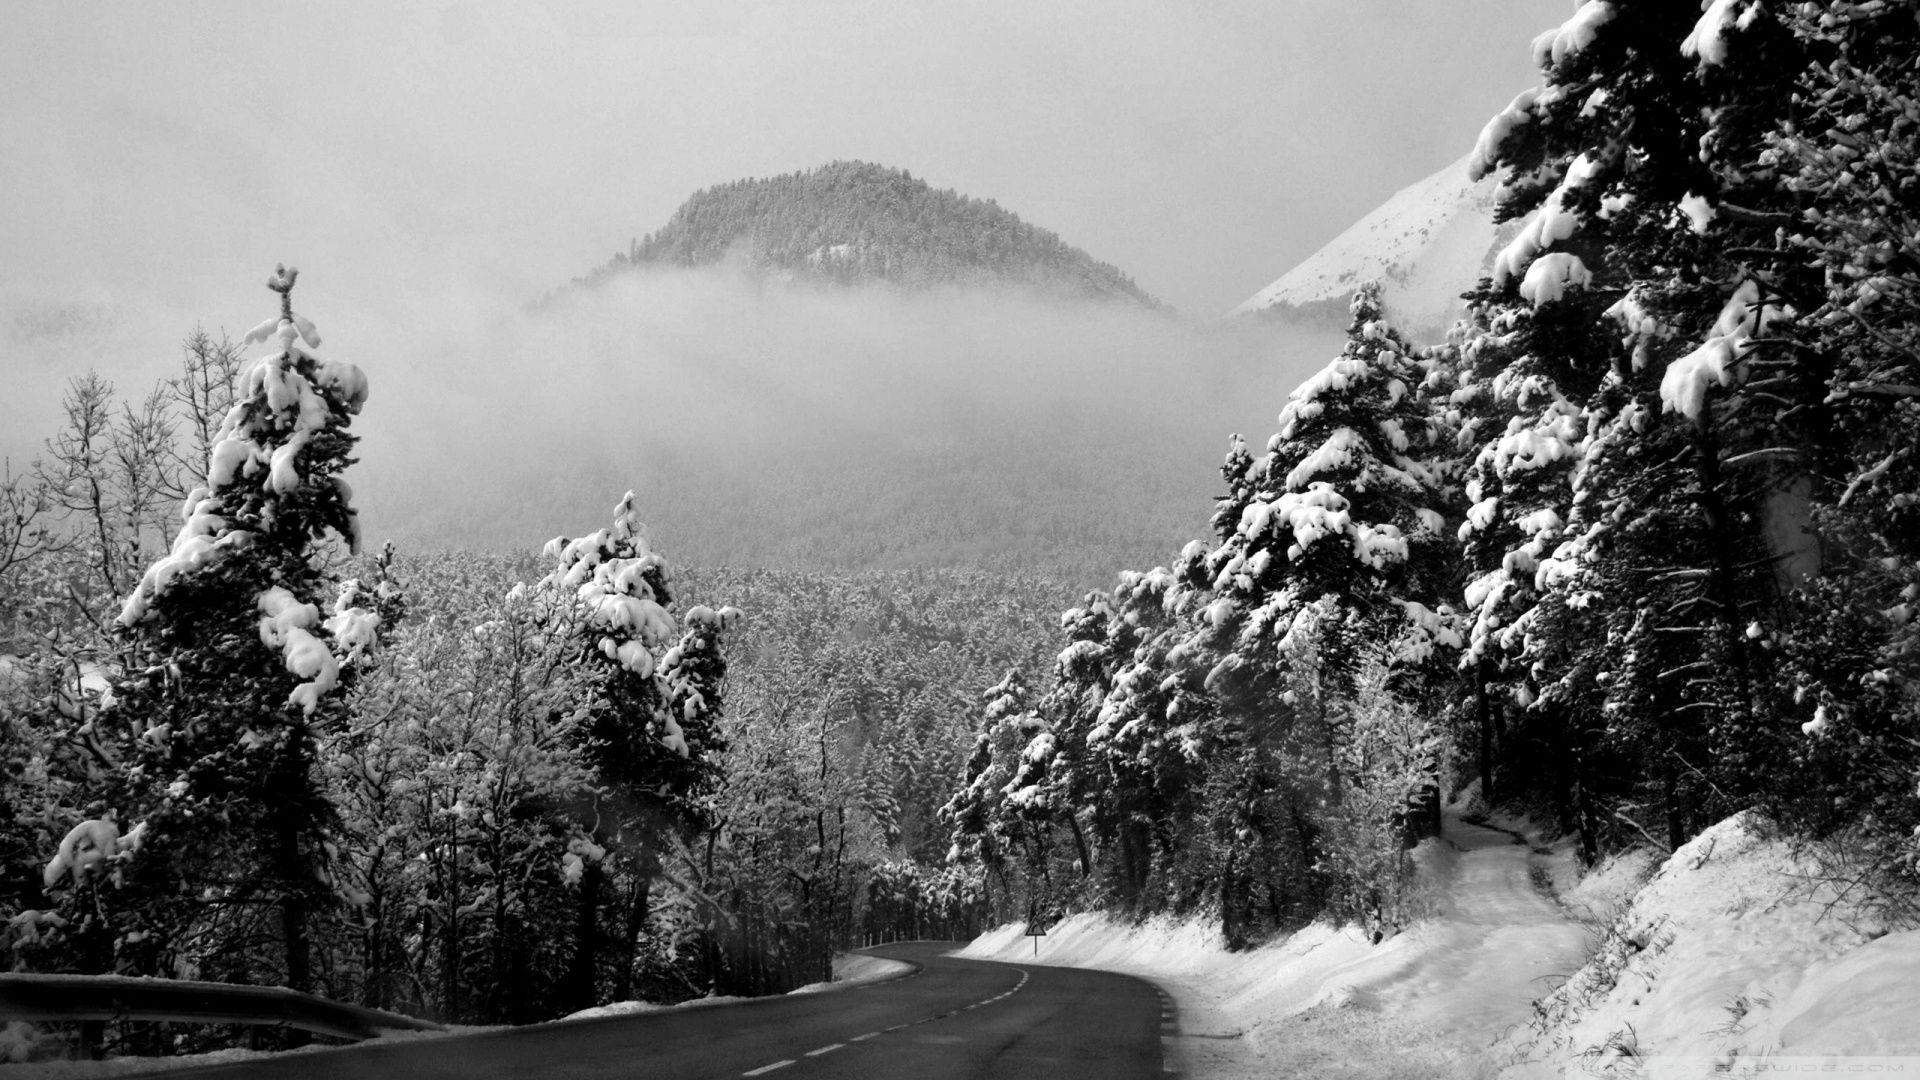 Winter Road Wallpaper Free Download